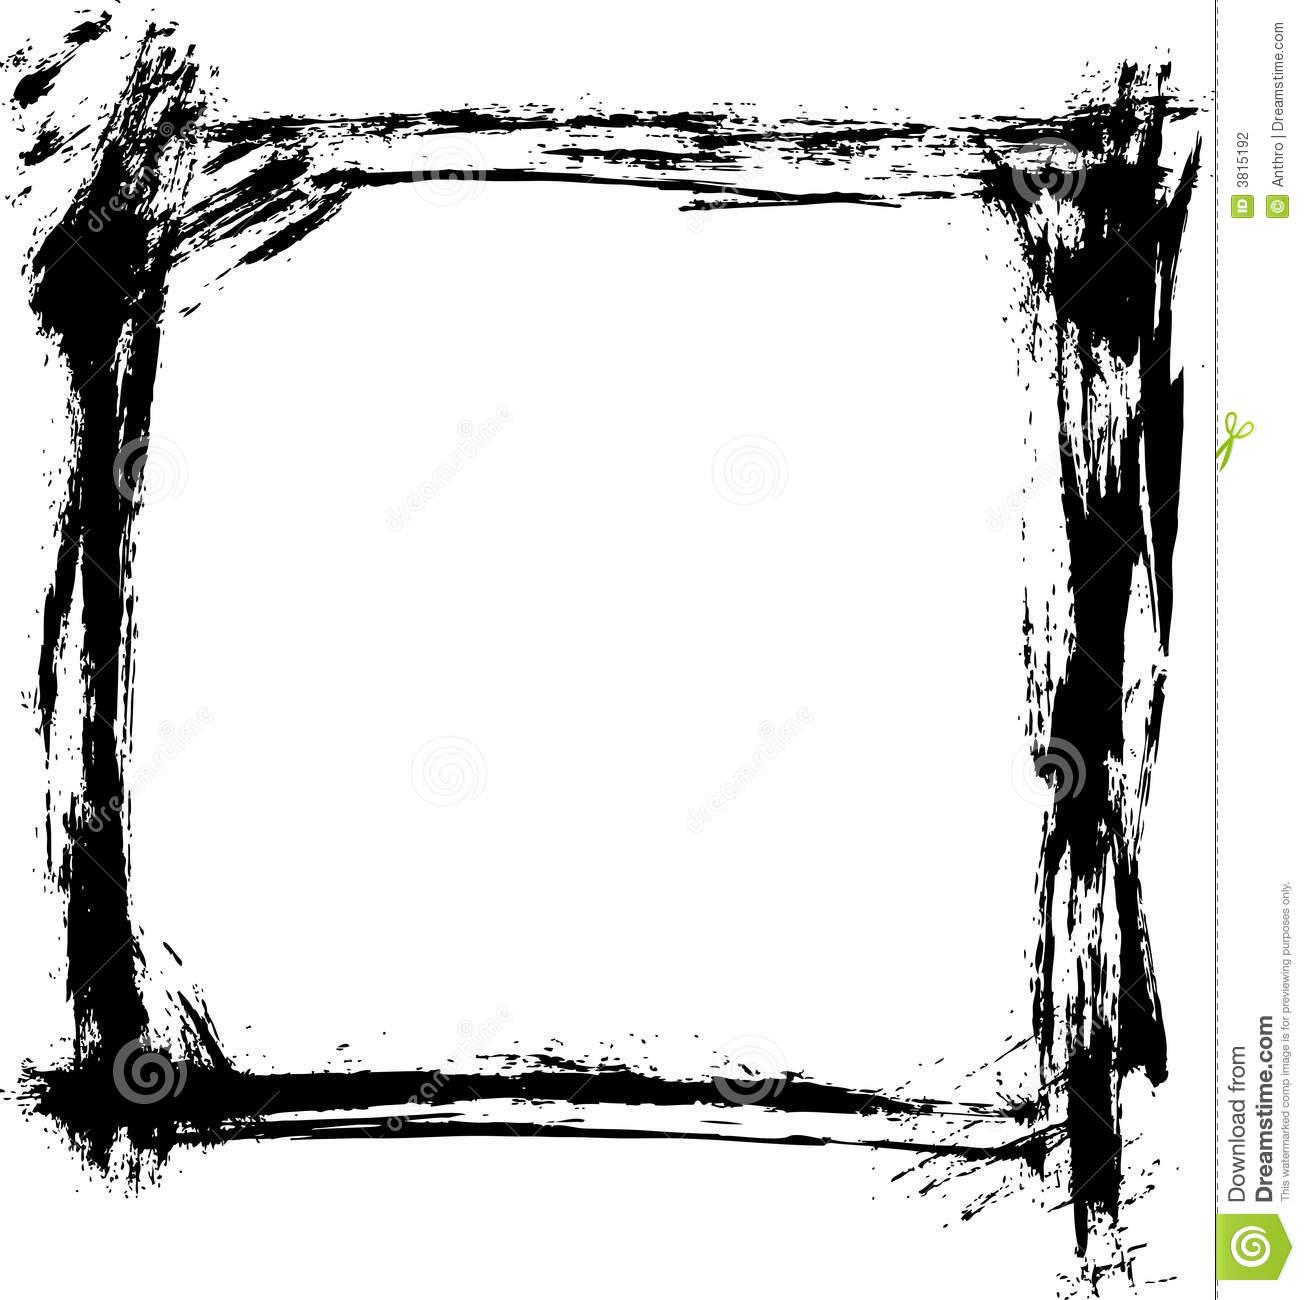 17 Vector Brush Frame Images